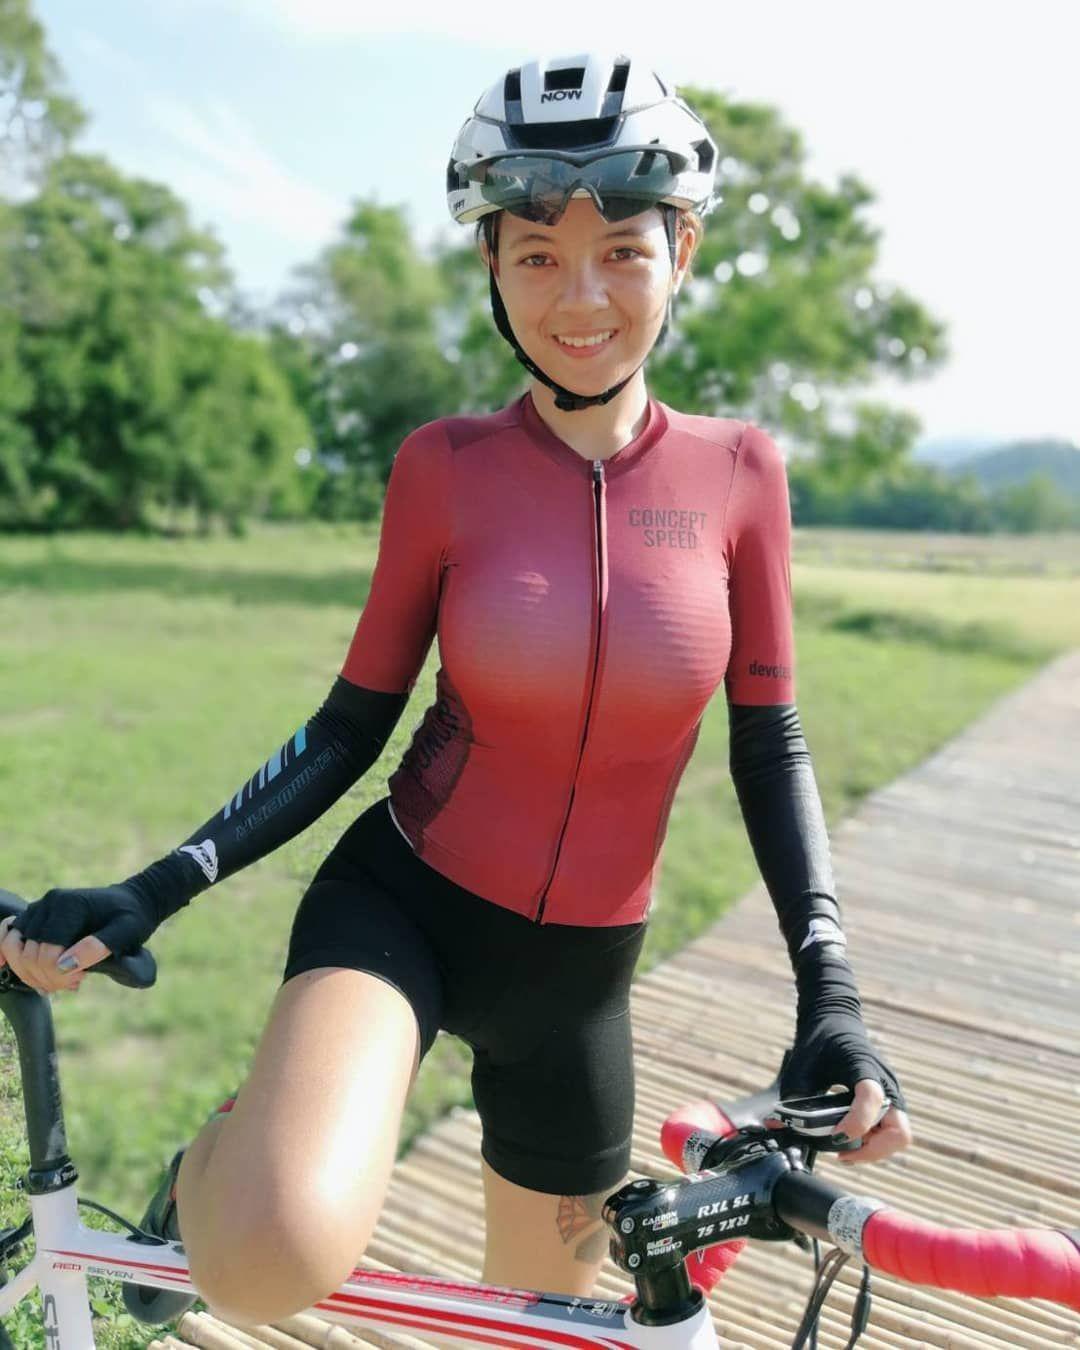 Sexy Radlerin